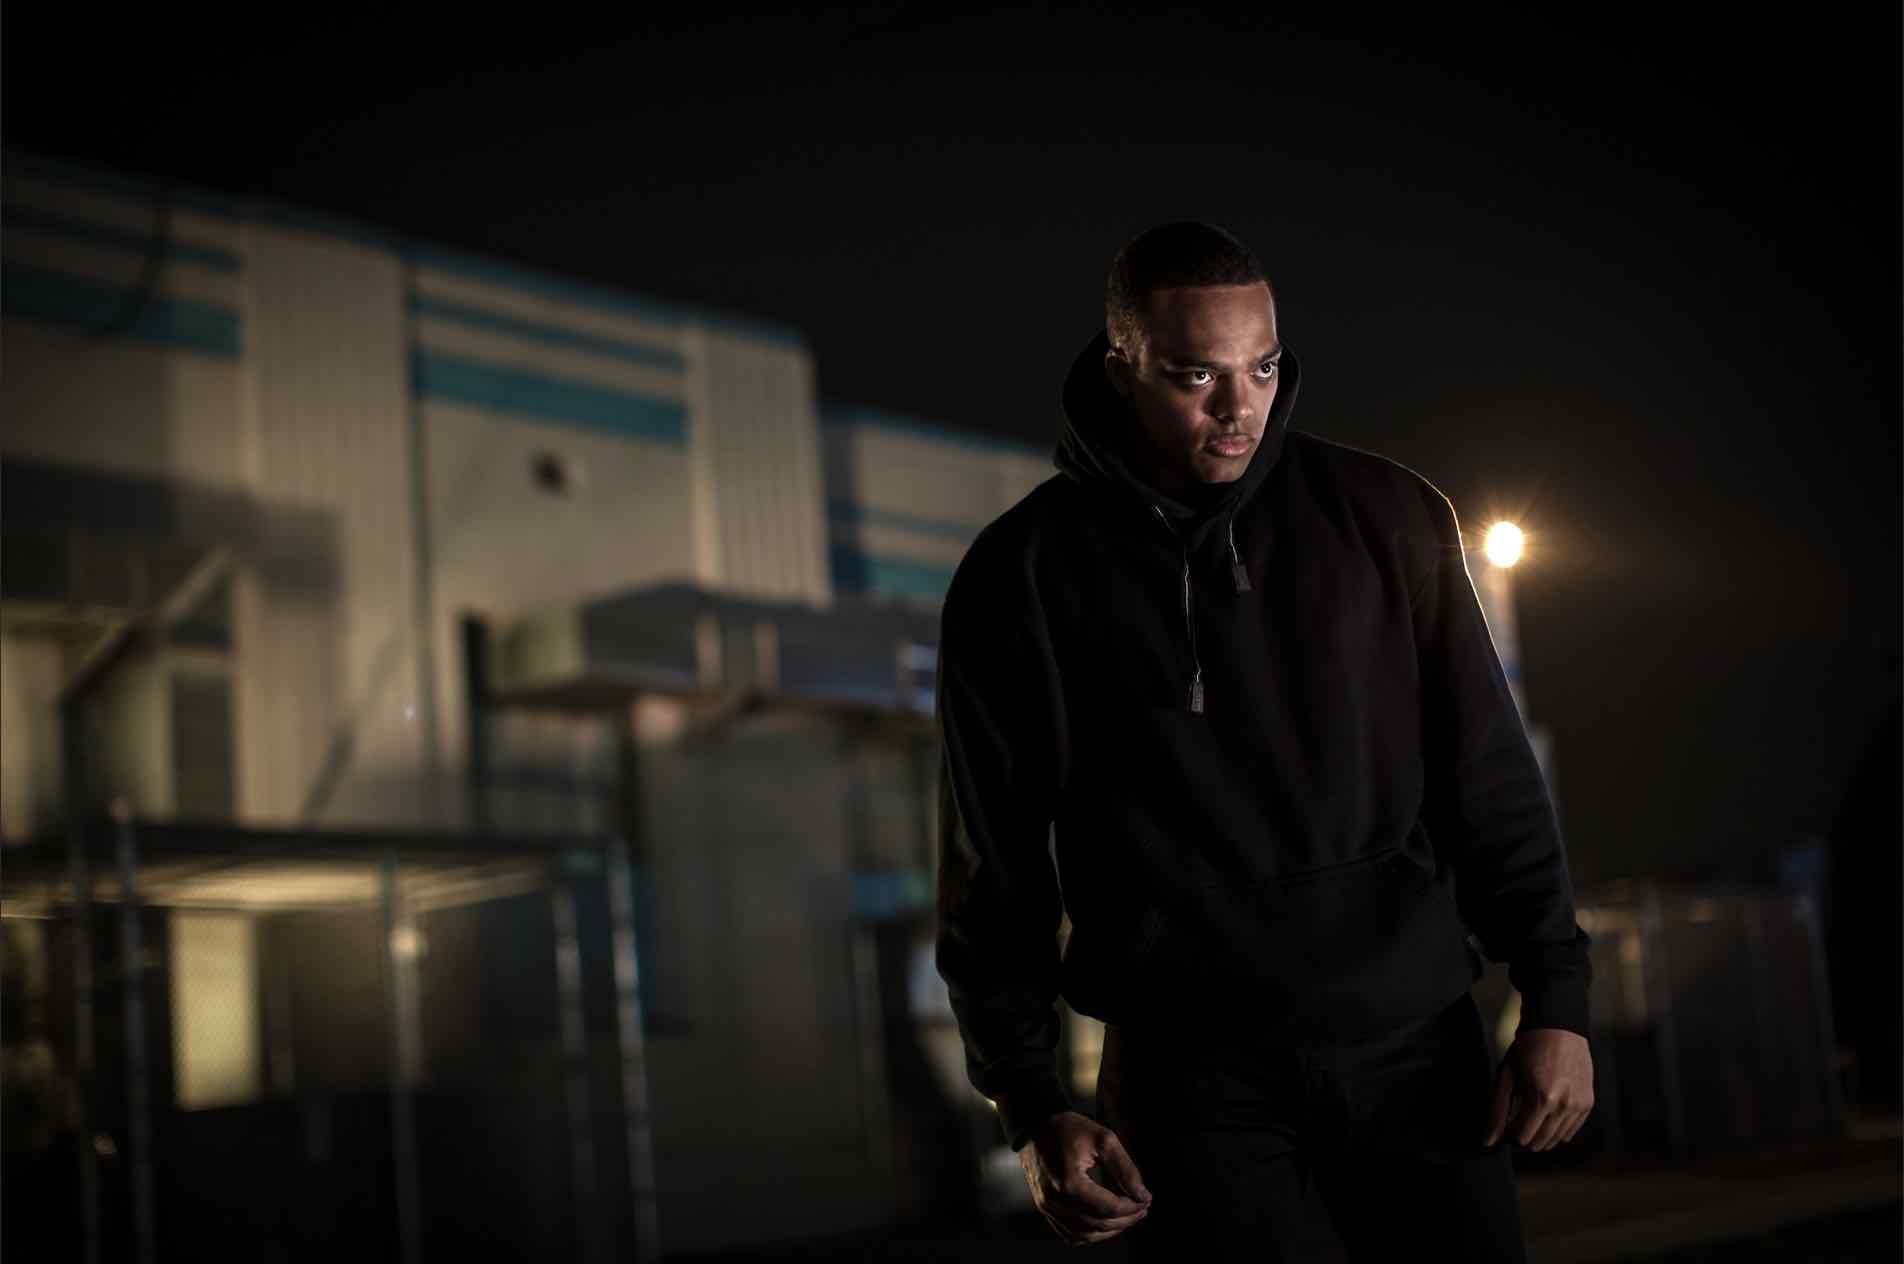 [News] Groundbreaking THRILLER Has Landed on Netflix